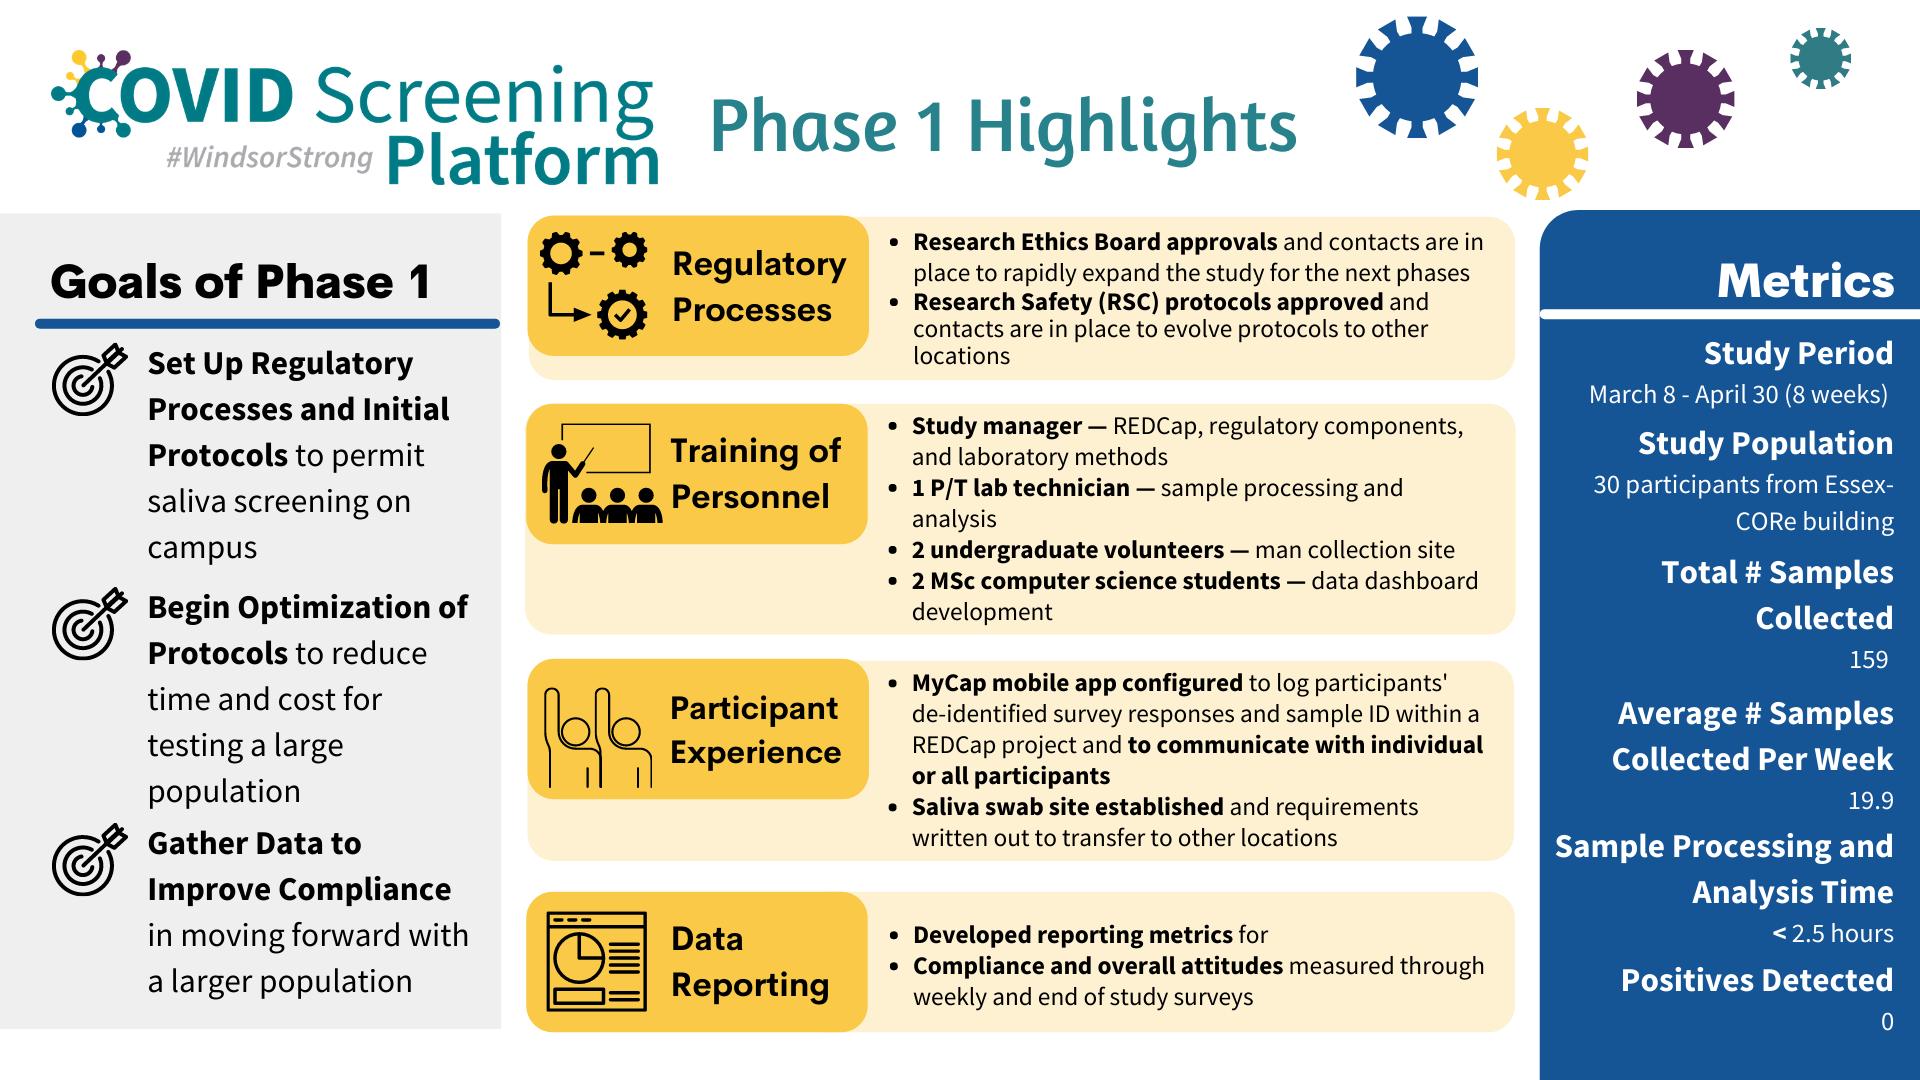 COVID Screening - Phase 1 Highlights